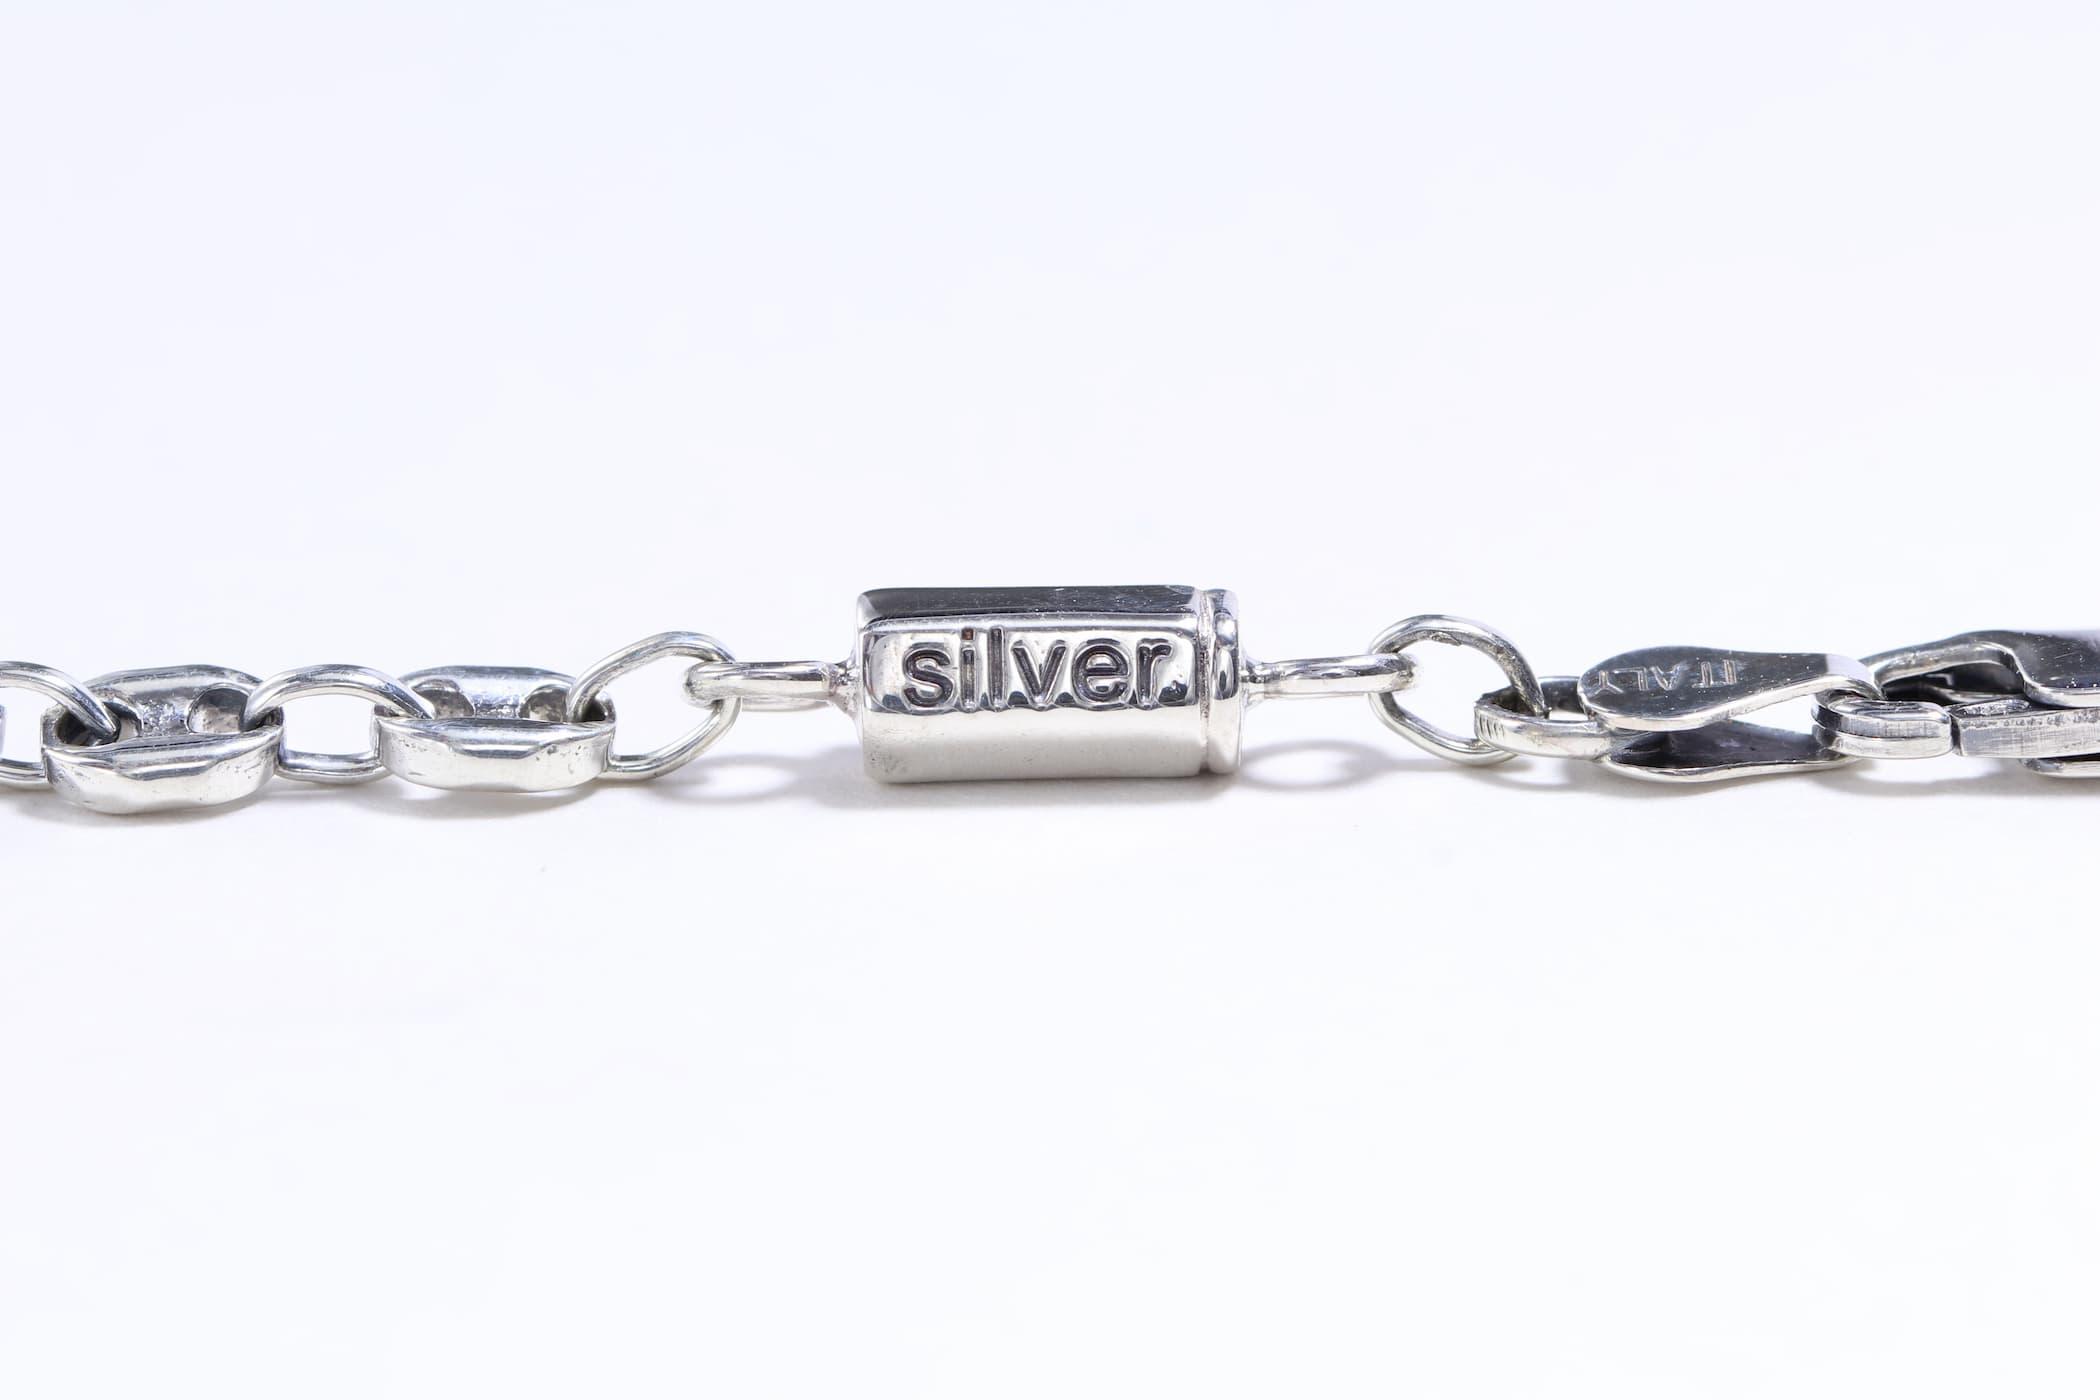 silver刻印アップ画像